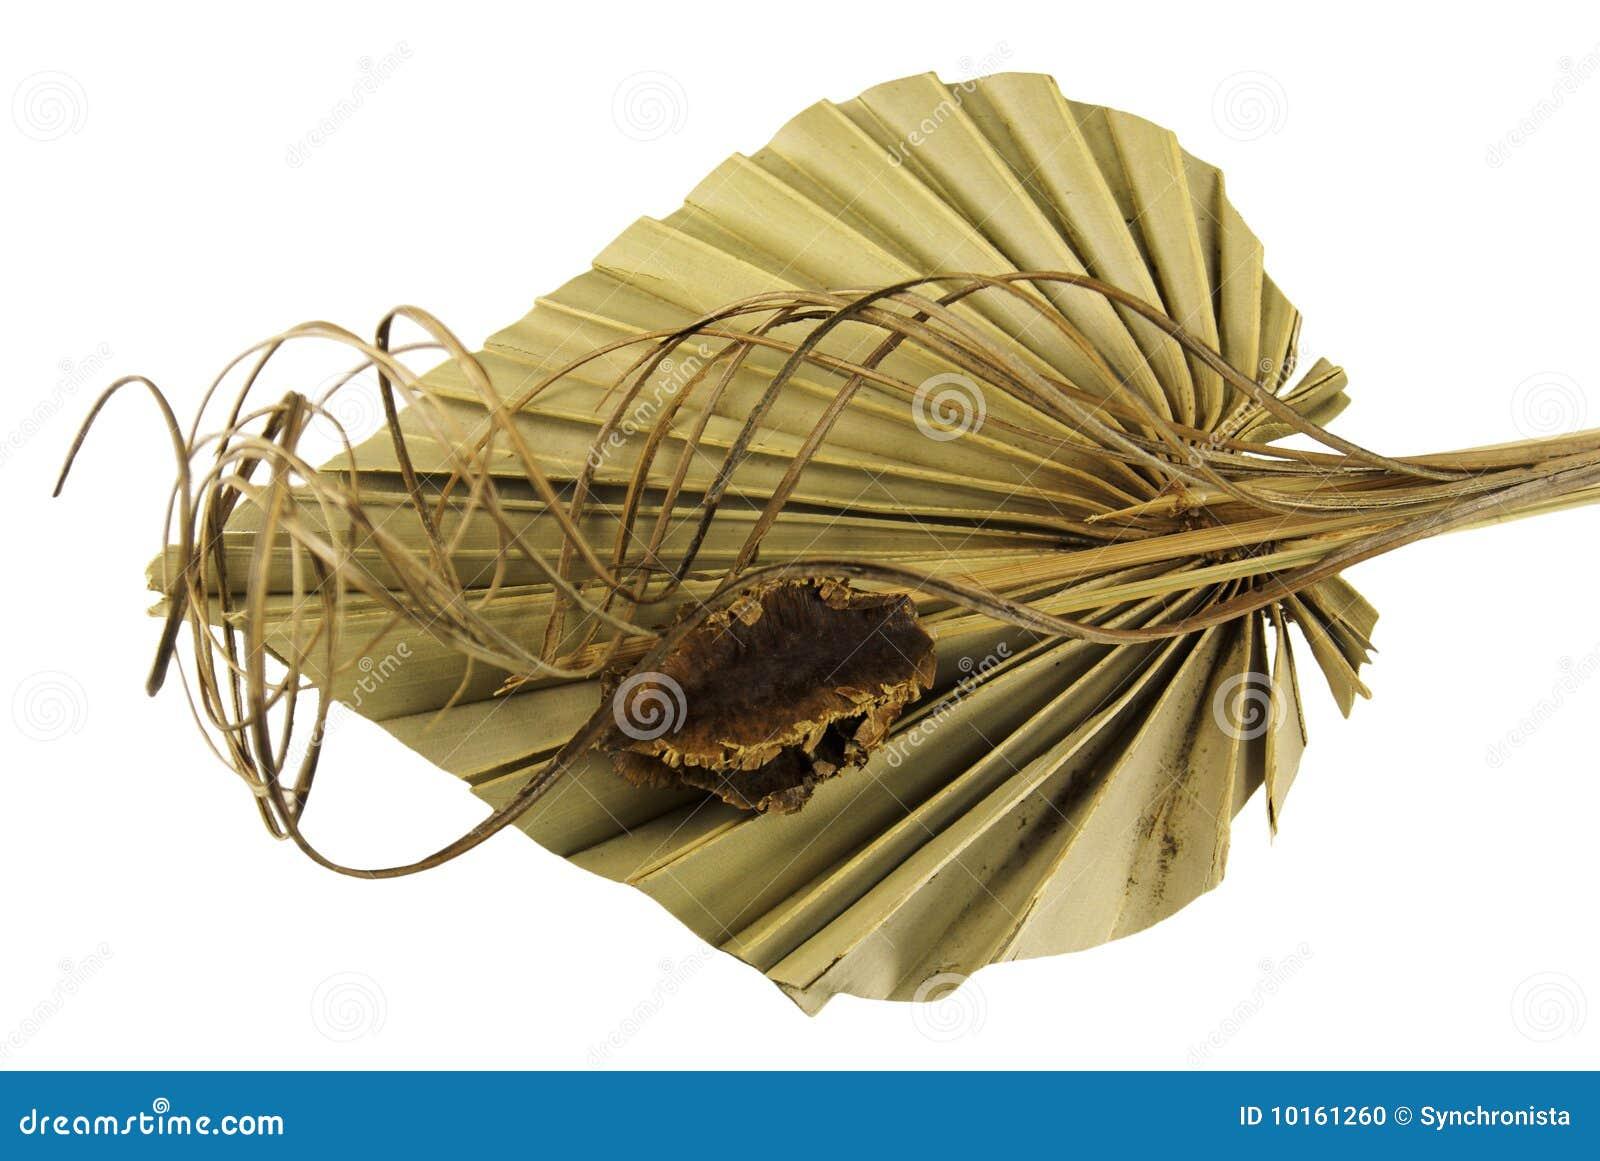 Decorative dried palm leaf